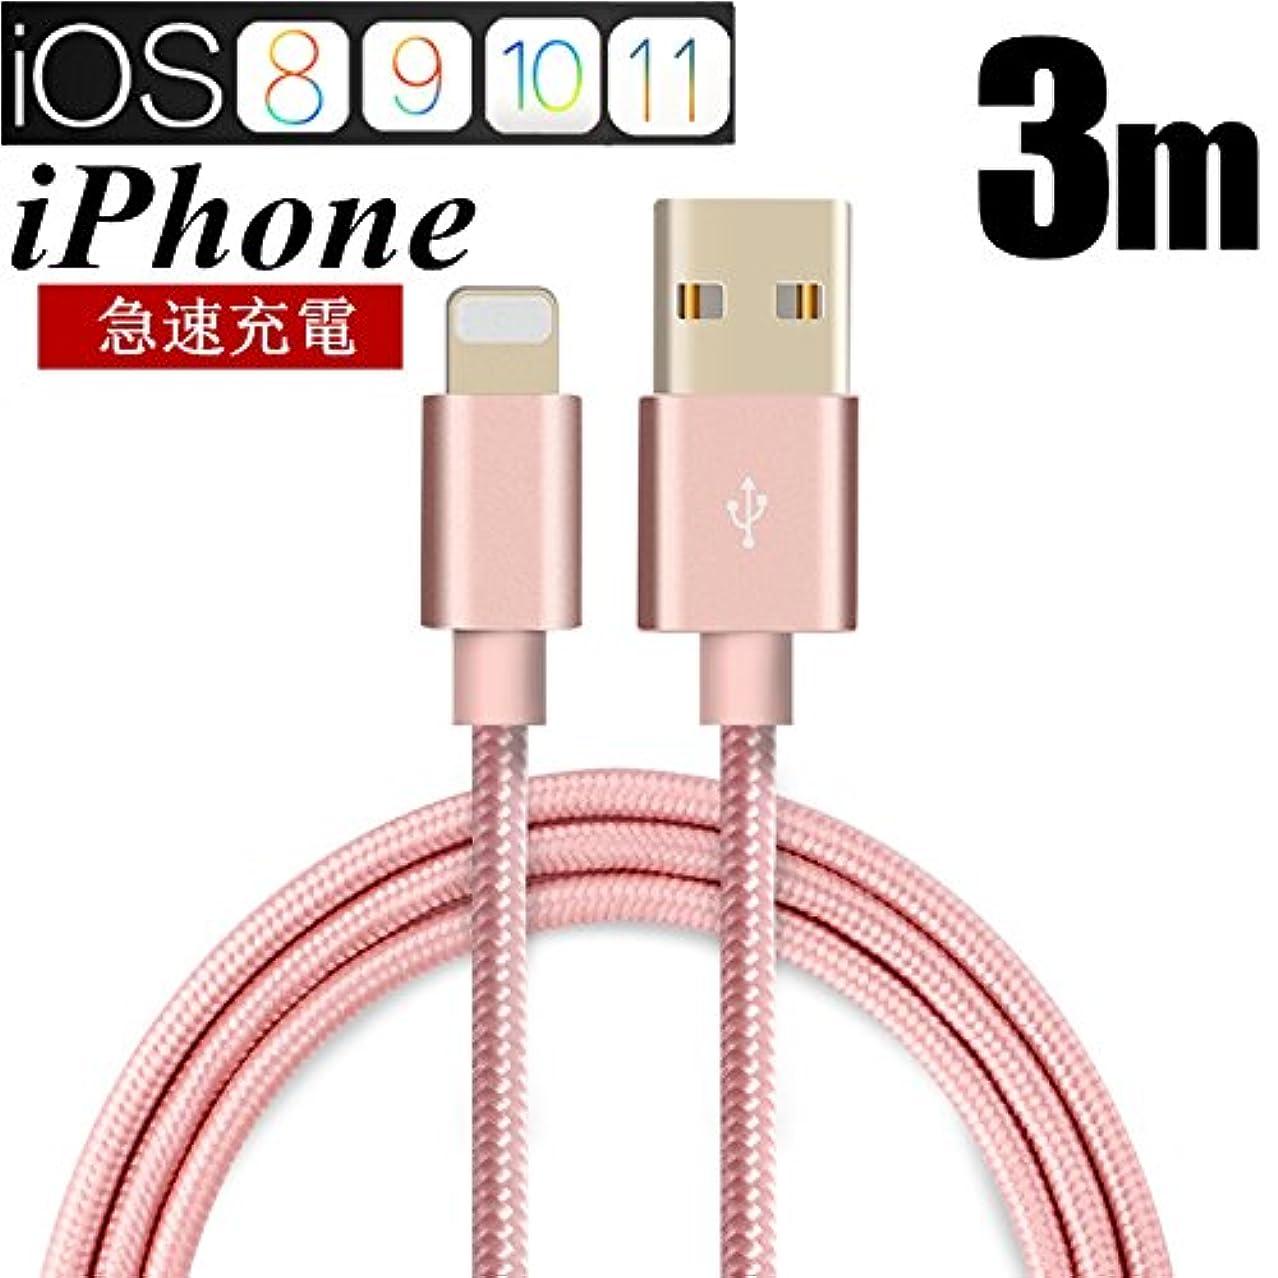 iPhoneケーブル 長さ 3 m 急速充電 充電器 データ転送ケーブル USBケーブルiPad iPhone用 充電ケーブル iPhone8/8Plus iPhoneX 7/6s/6 plusスマホ合金ケーブル (3 m, ローズゴールド)